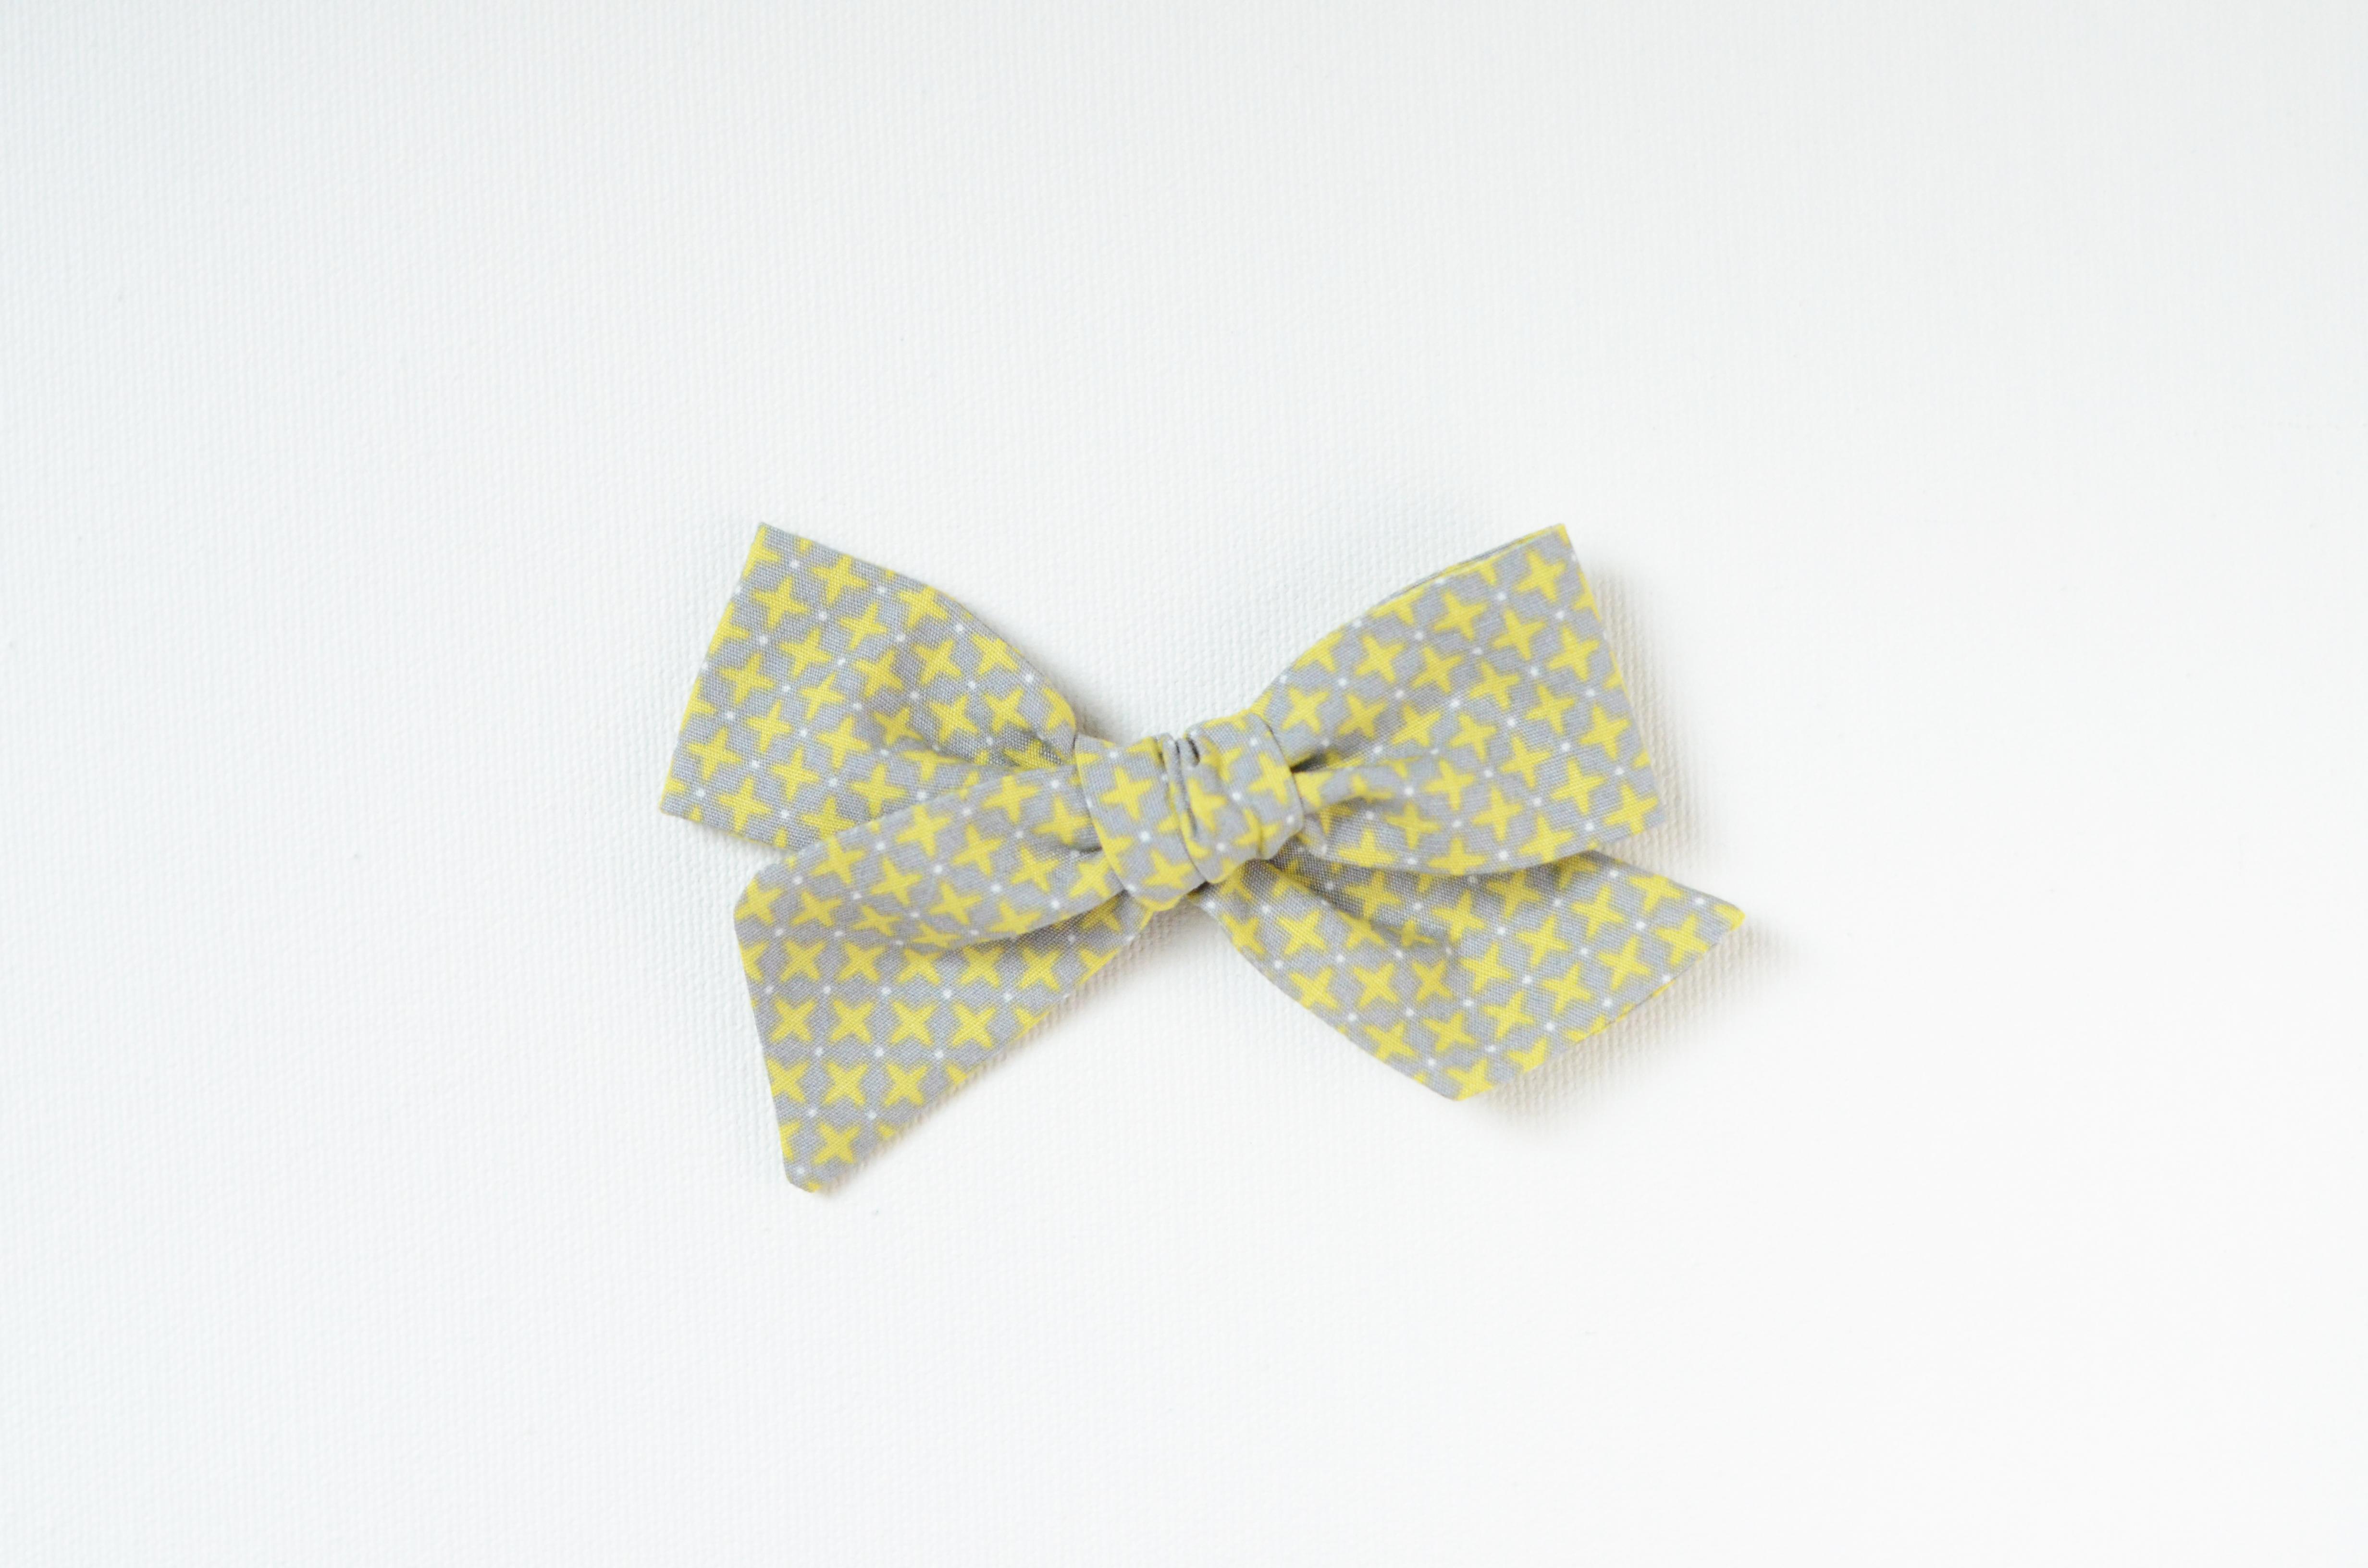 Medium Lizzy Bow - Crisscross Green on Gray